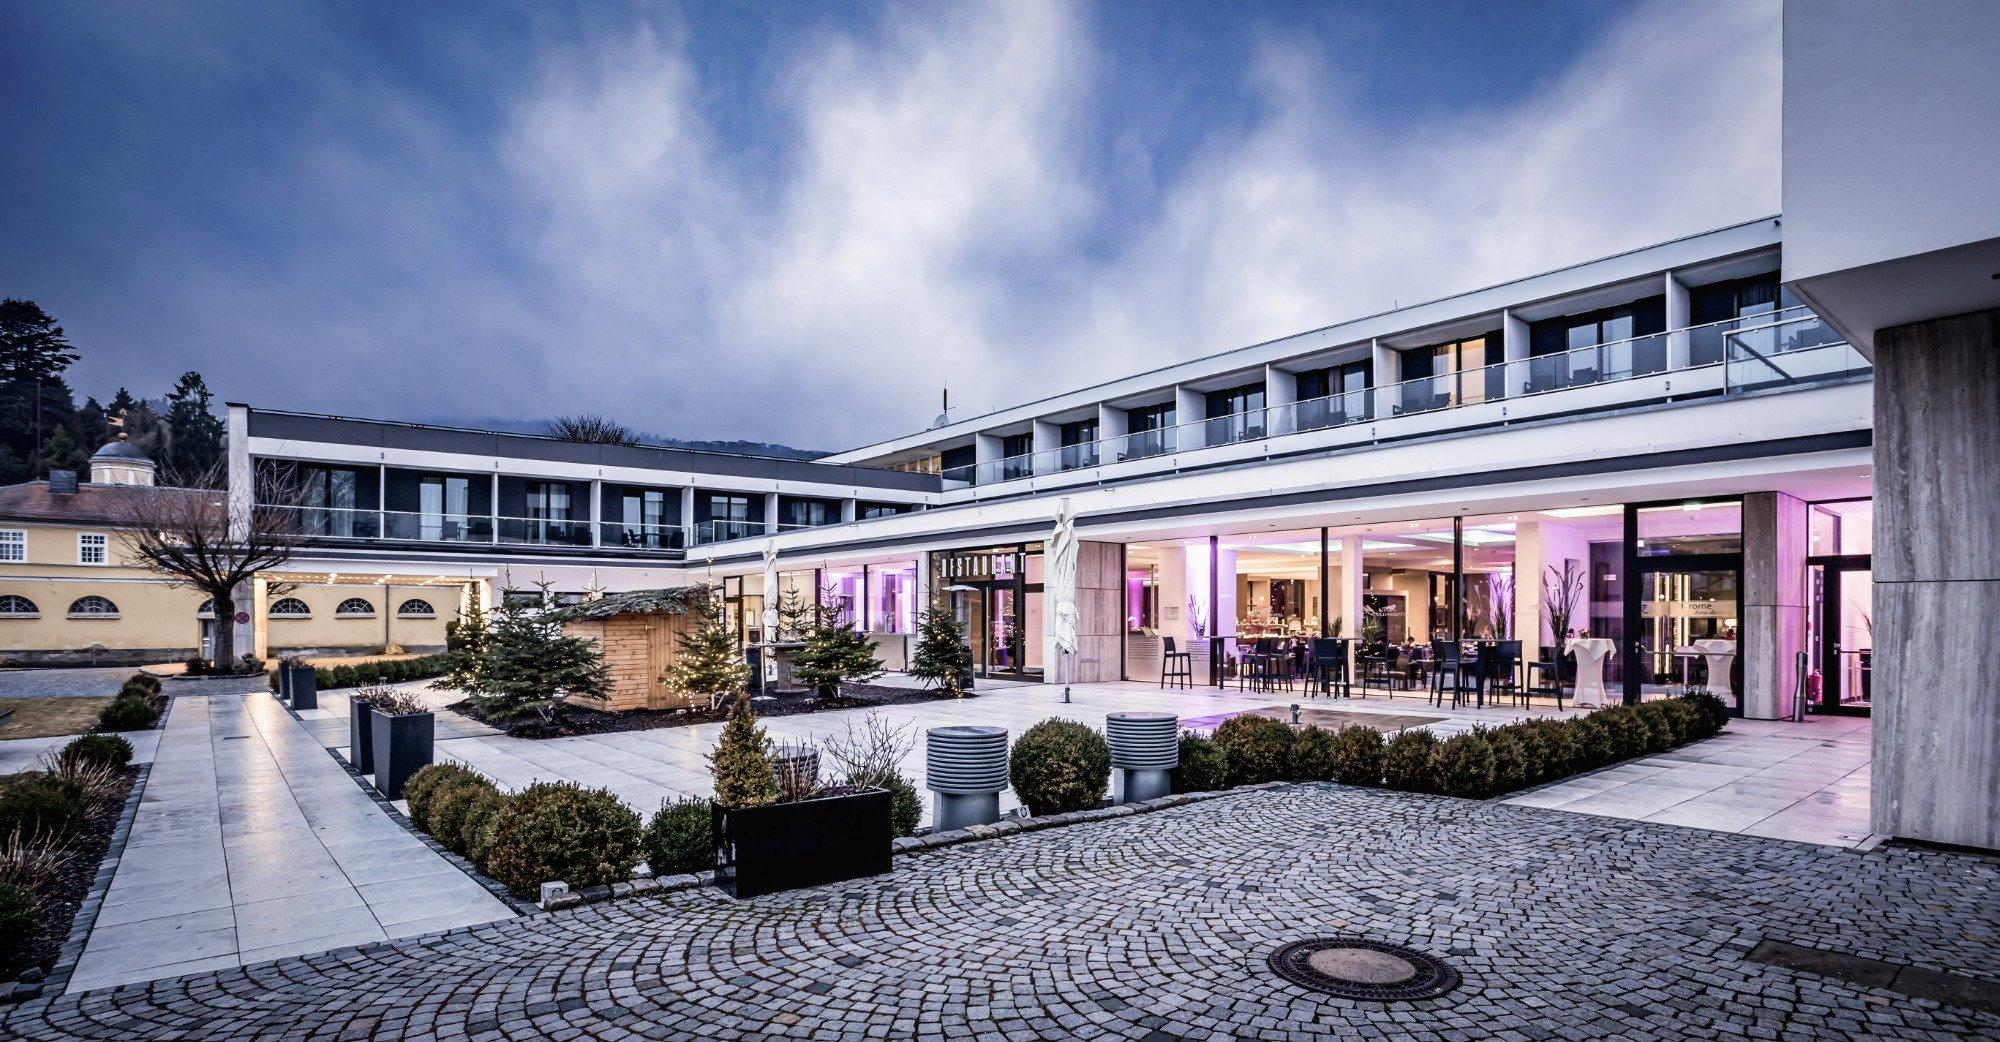 Schlosshotel Bad Wilhelmshoehe Conference & Spa